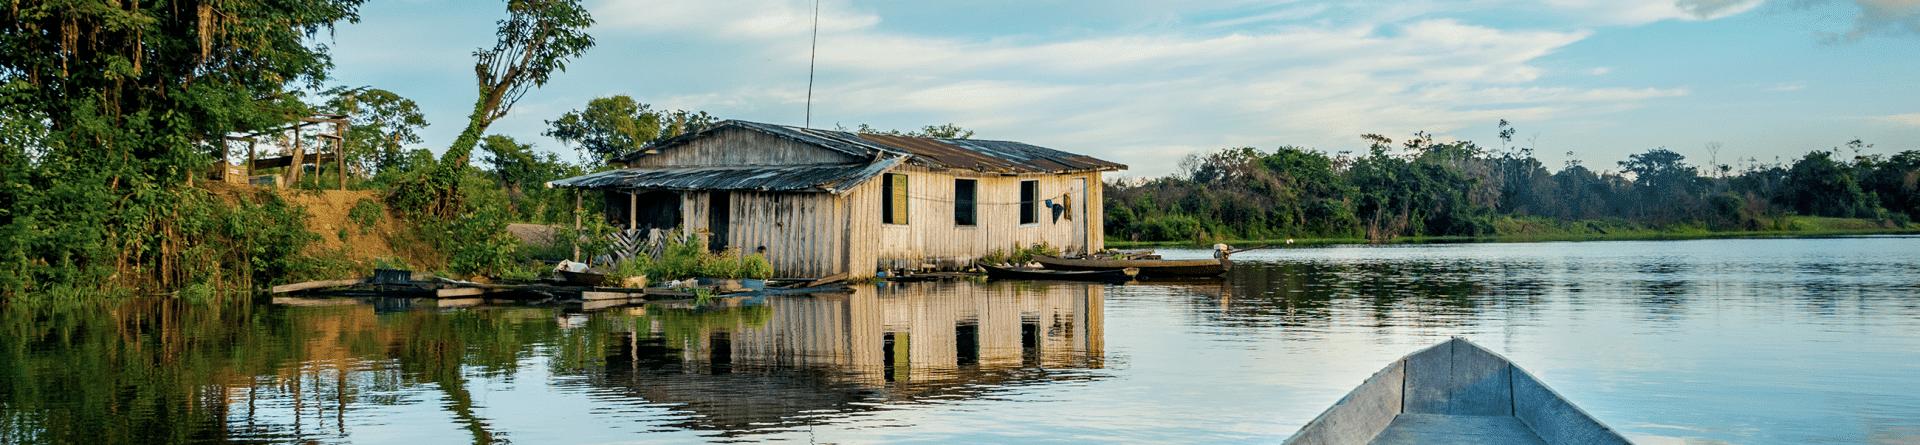 amazon-river-treehouselodge